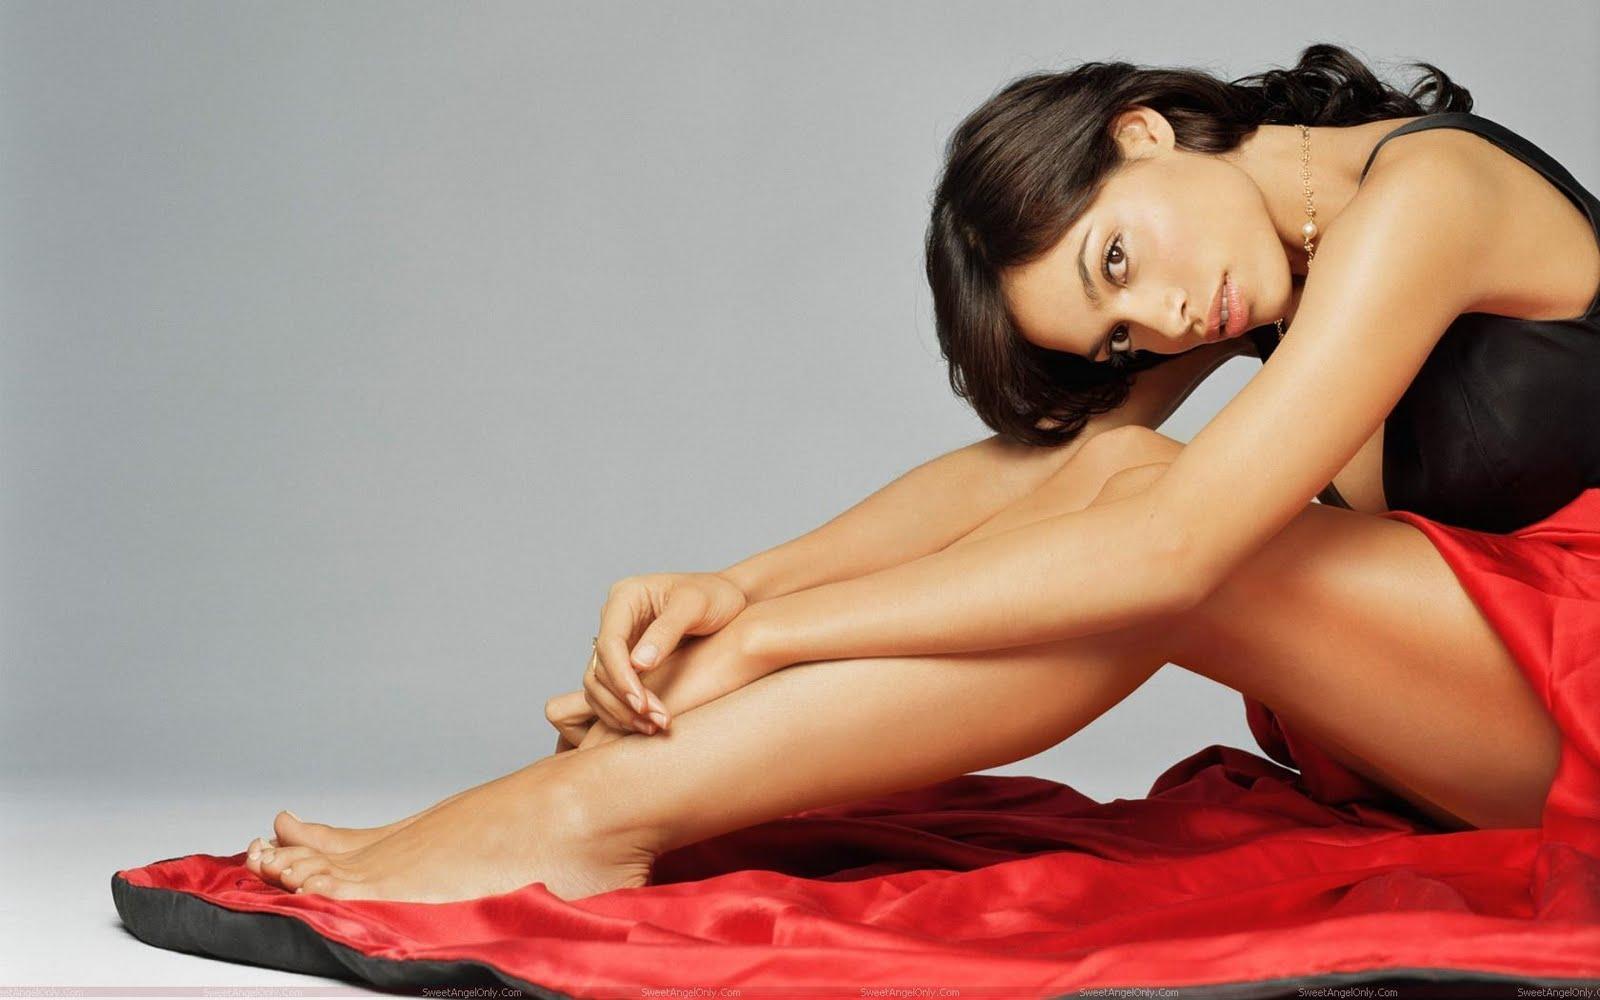 Rosario Dawson Biography And Latest Hot Wallpaper Hollywood Stars Hd 1600x1000